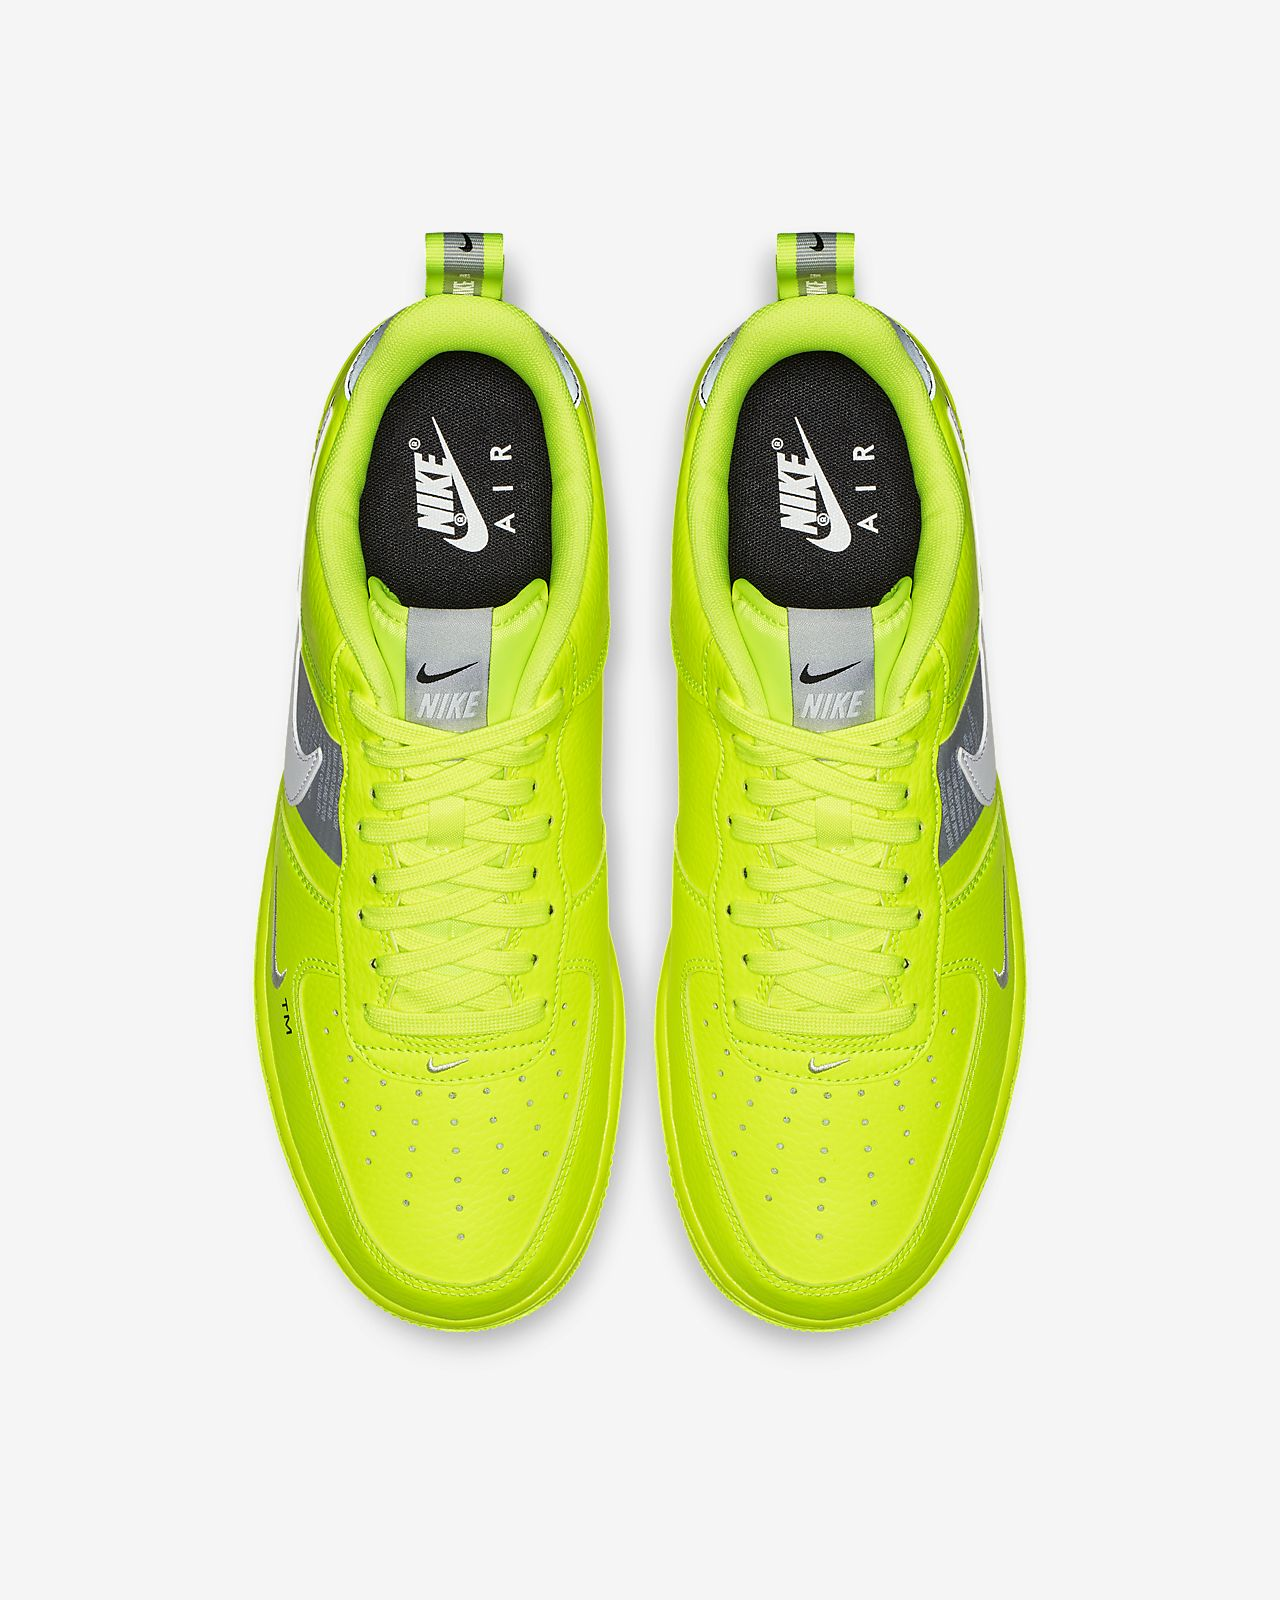 fdd448f38d690 Nike Air Force 1 '07 LV8 Utility Men's Shoe. Nike.com MY